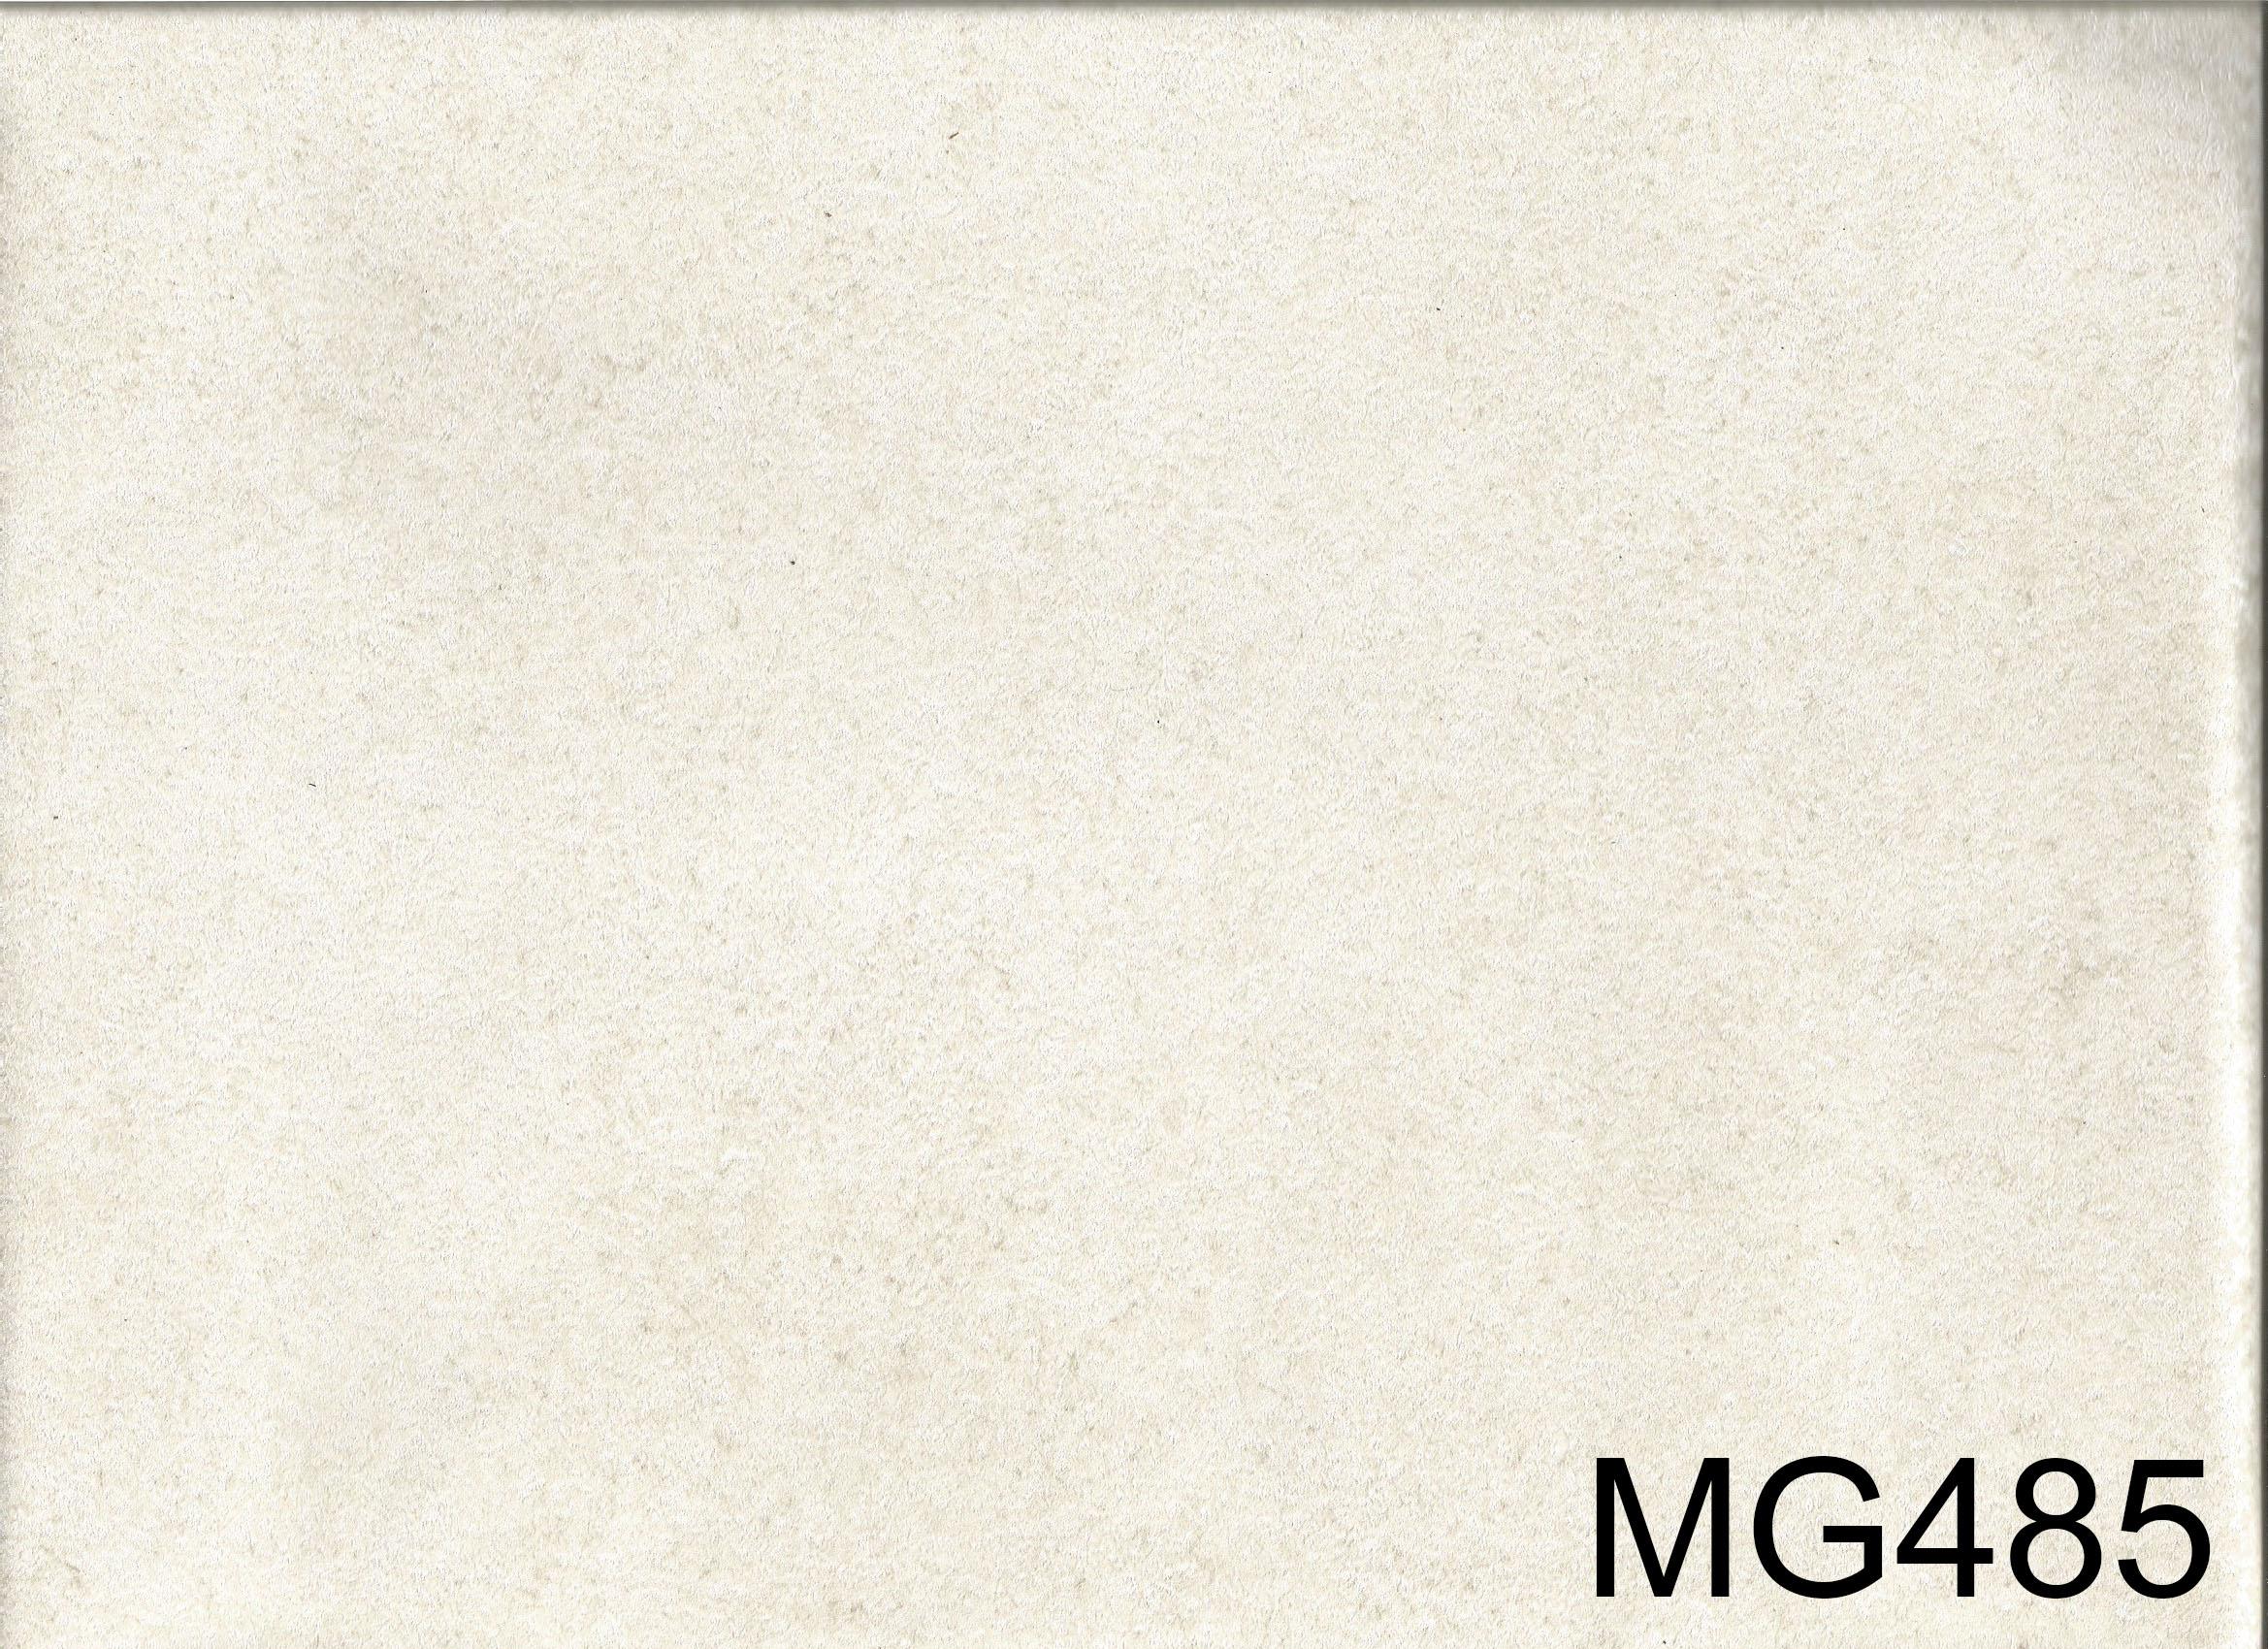 MG485